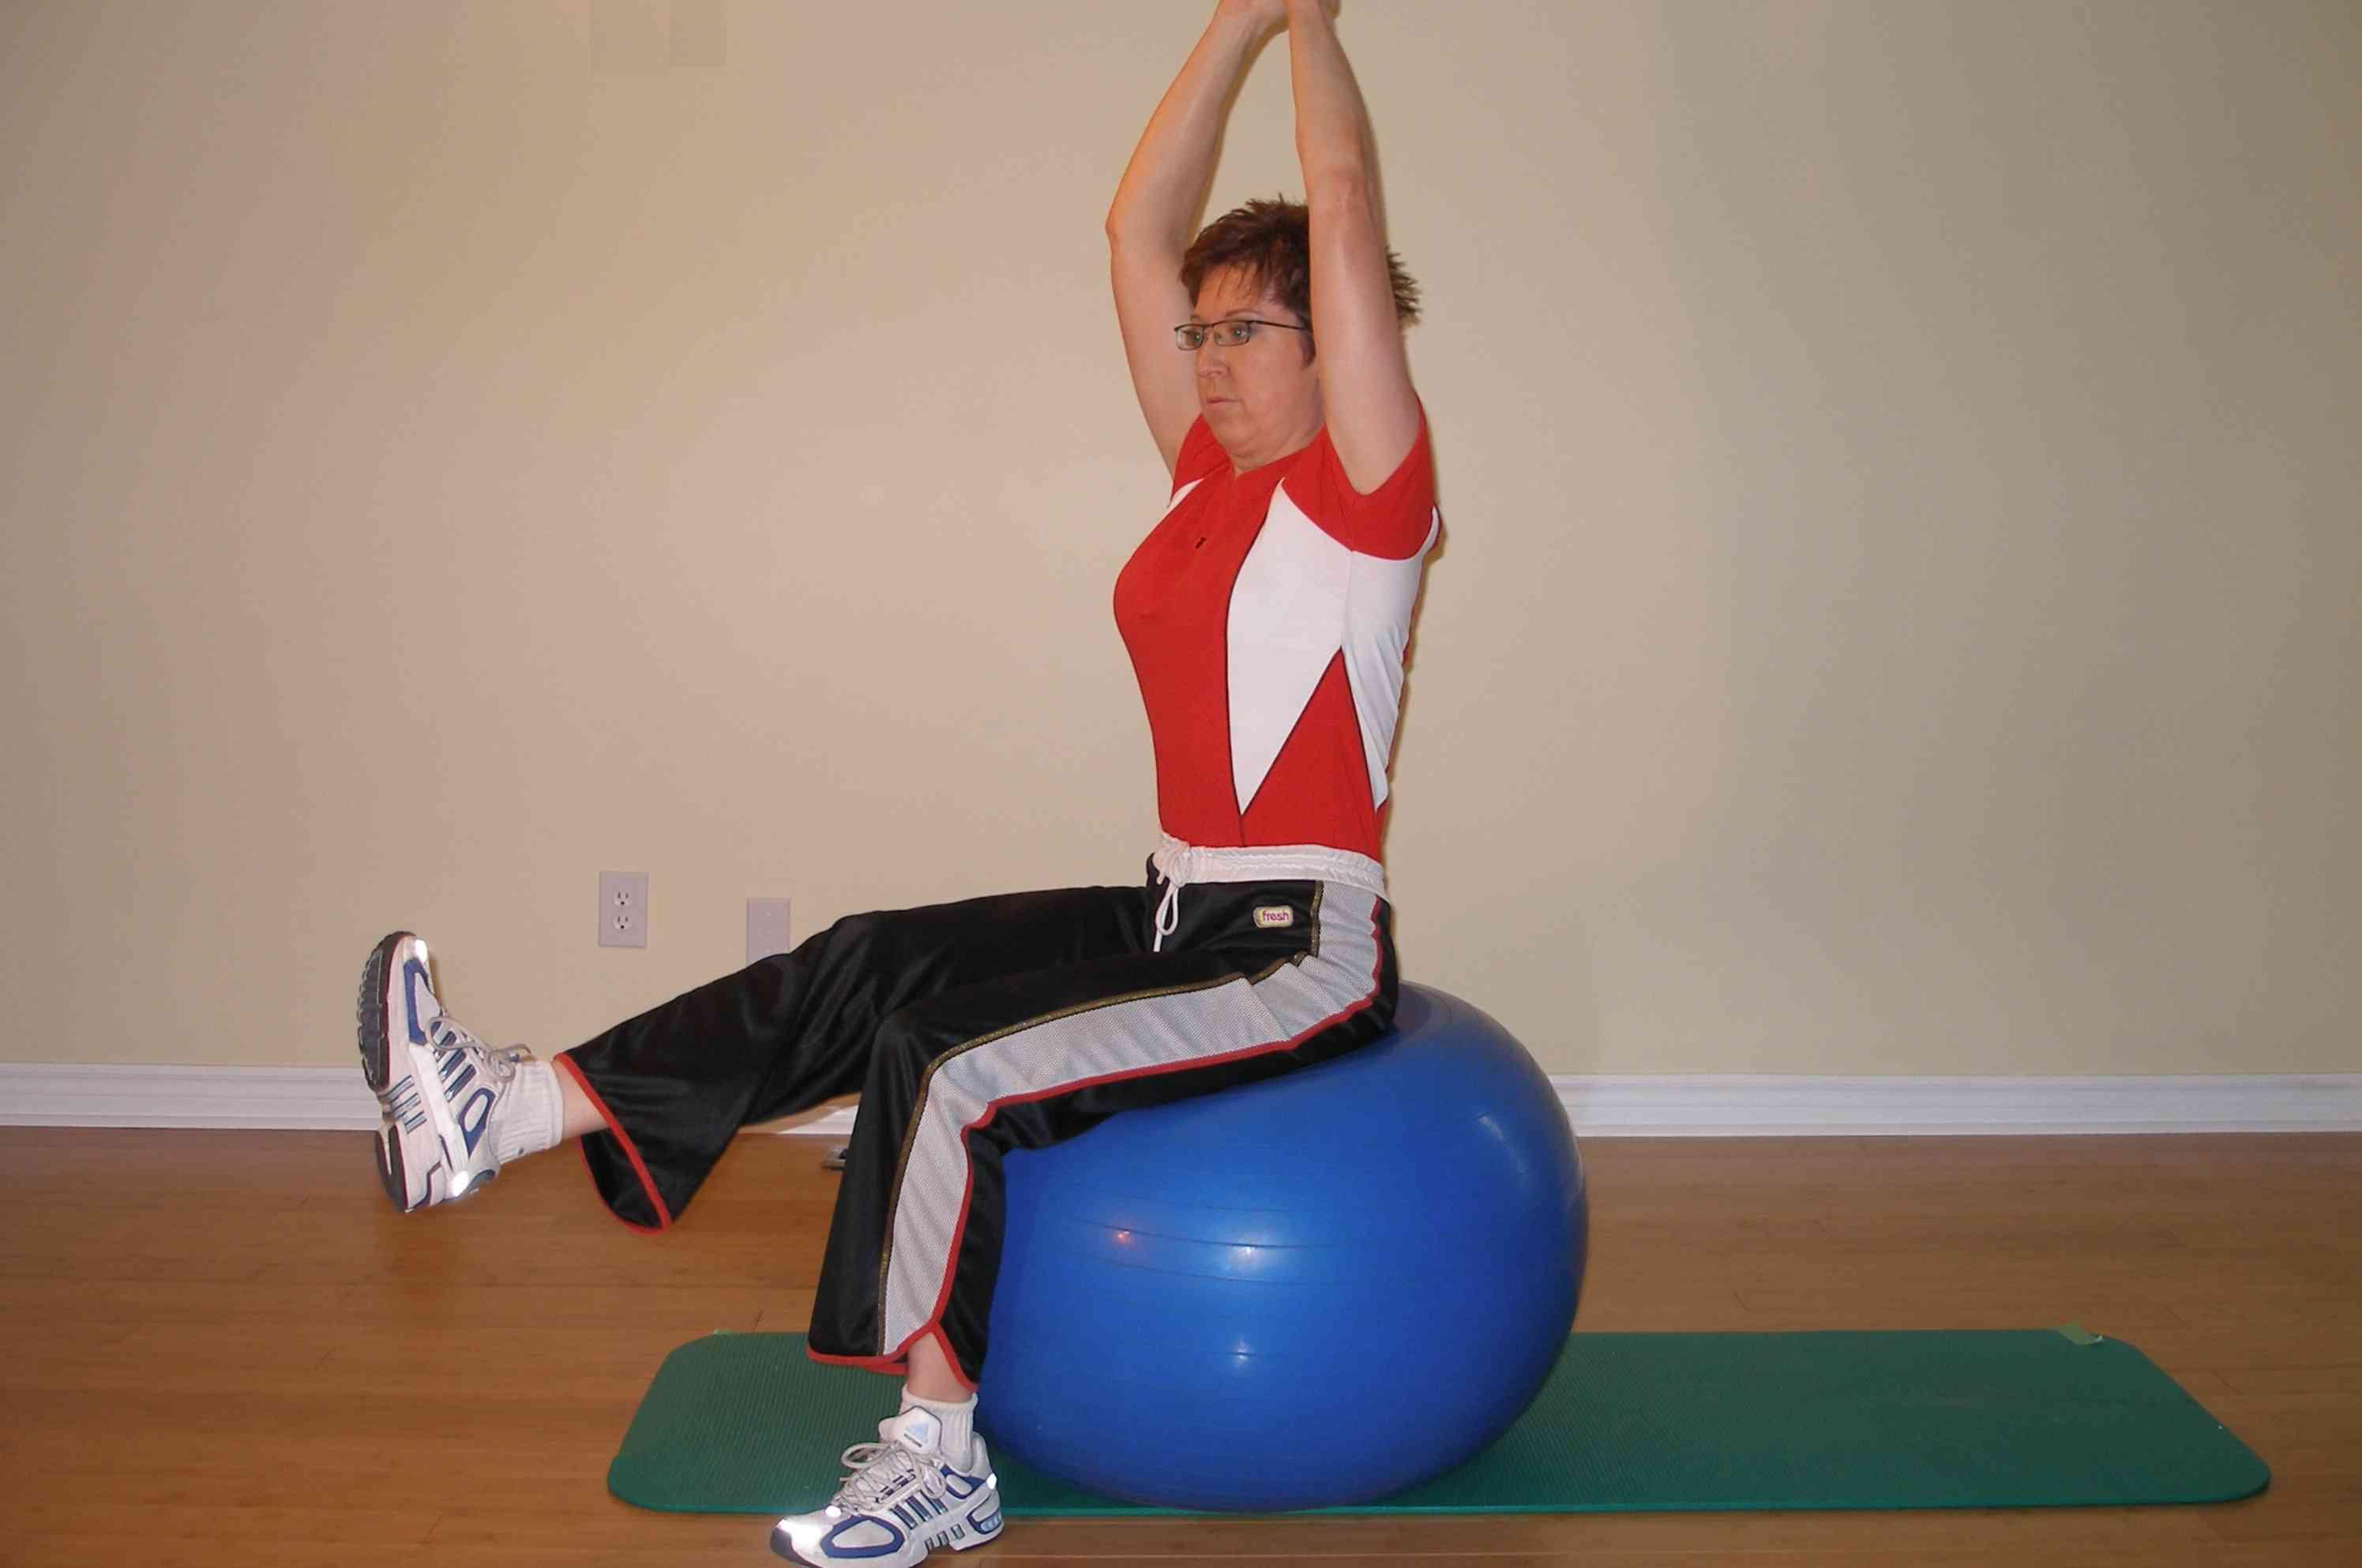 single leg raise ball exercise finish